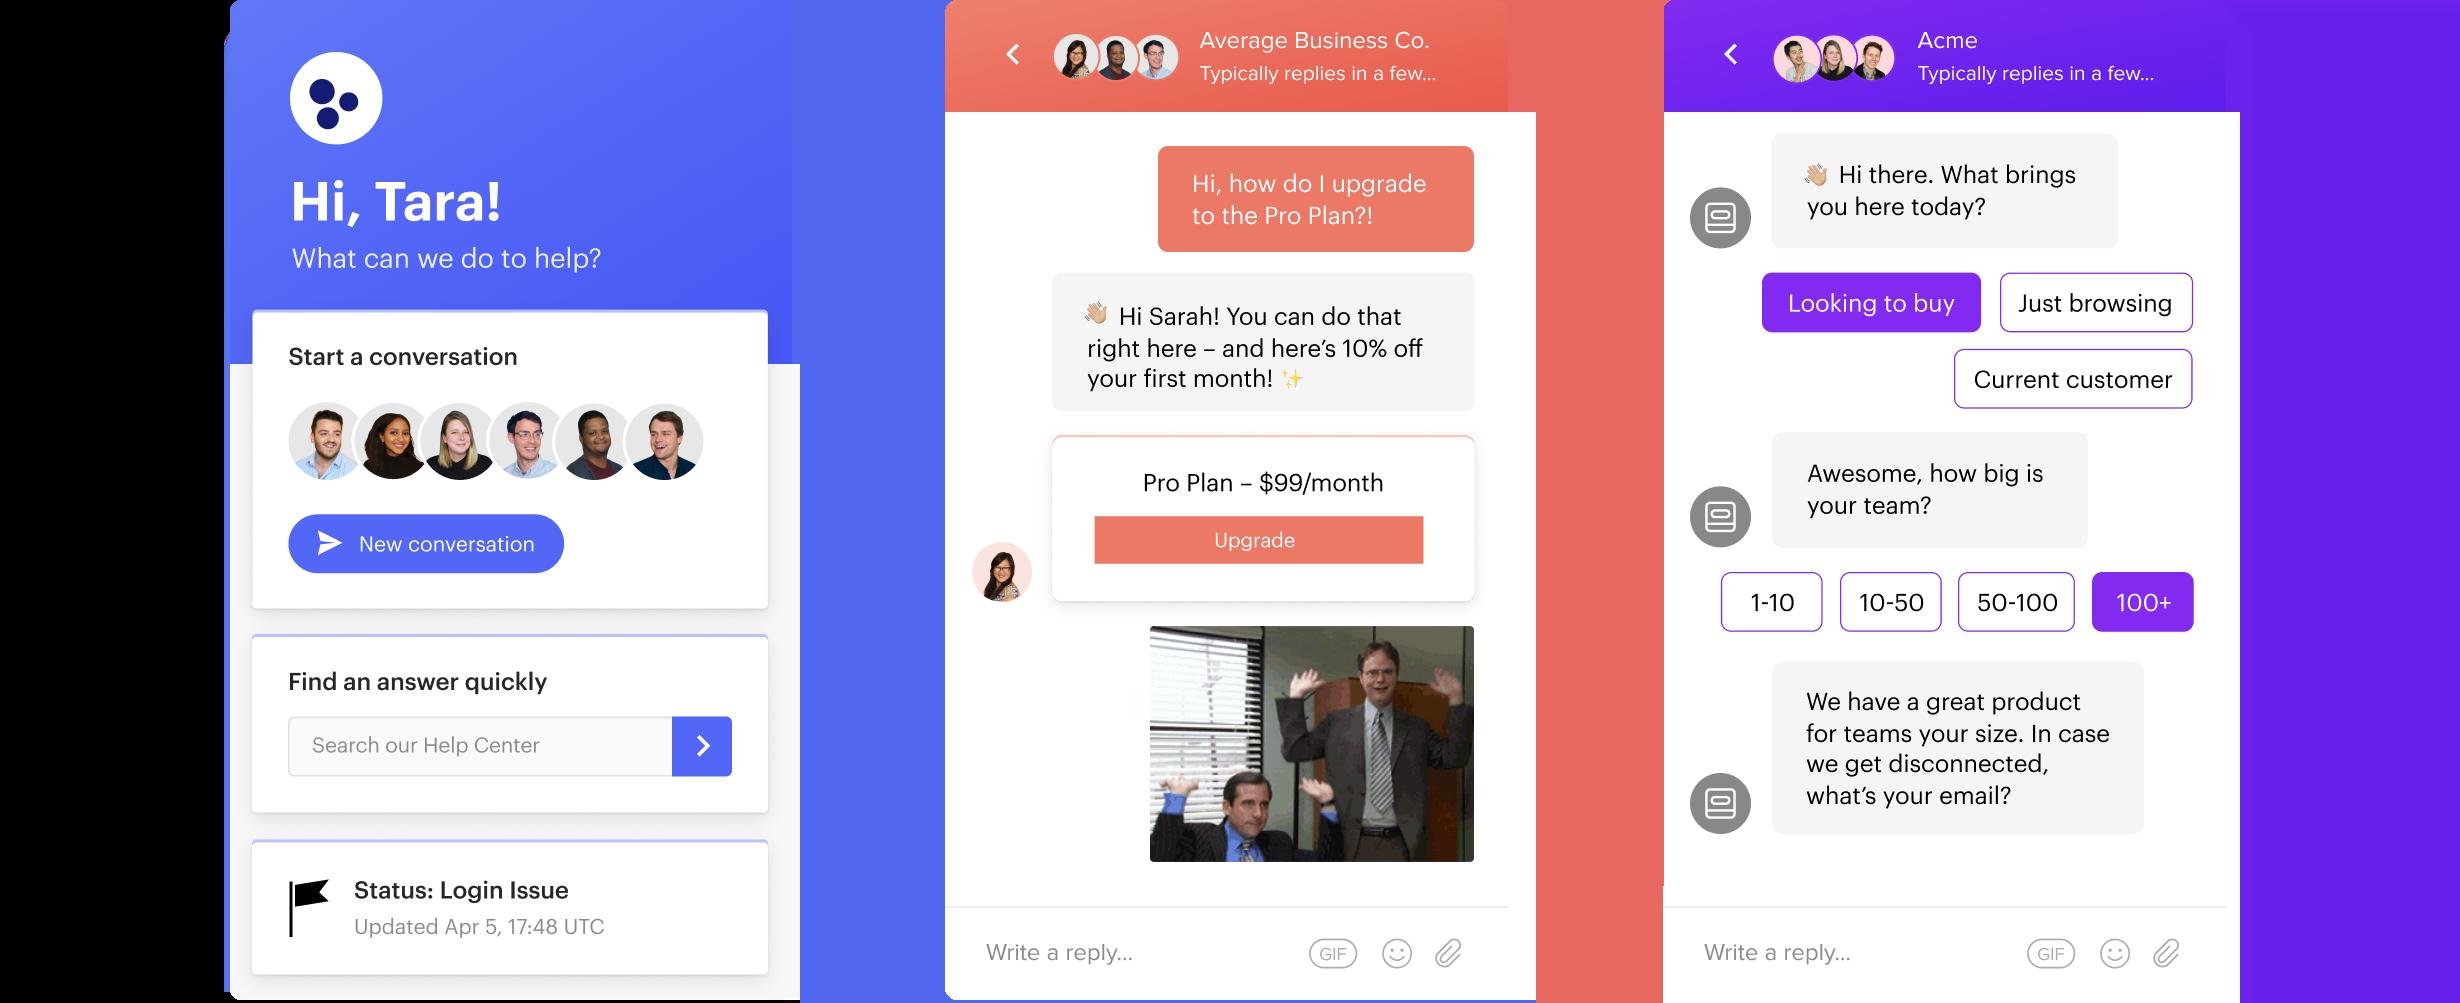 Three screenshots of the Intercom chat application